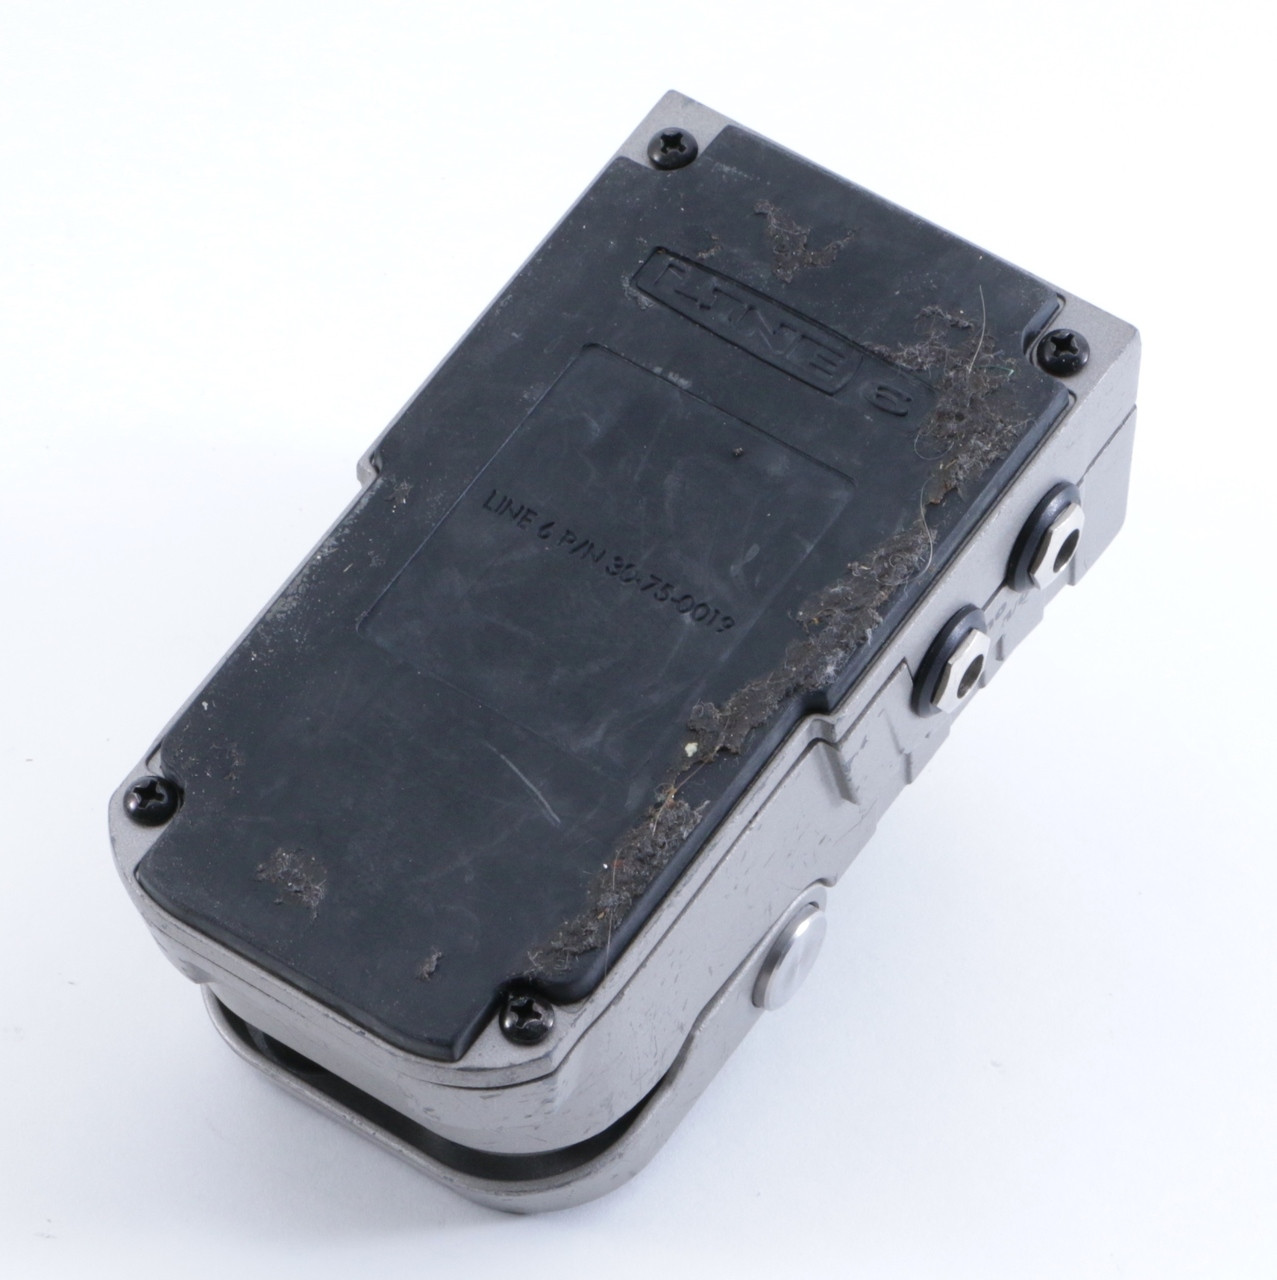 line 6 echo park delay guitar effects pedal p 04511. Black Bedroom Furniture Sets. Home Design Ideas